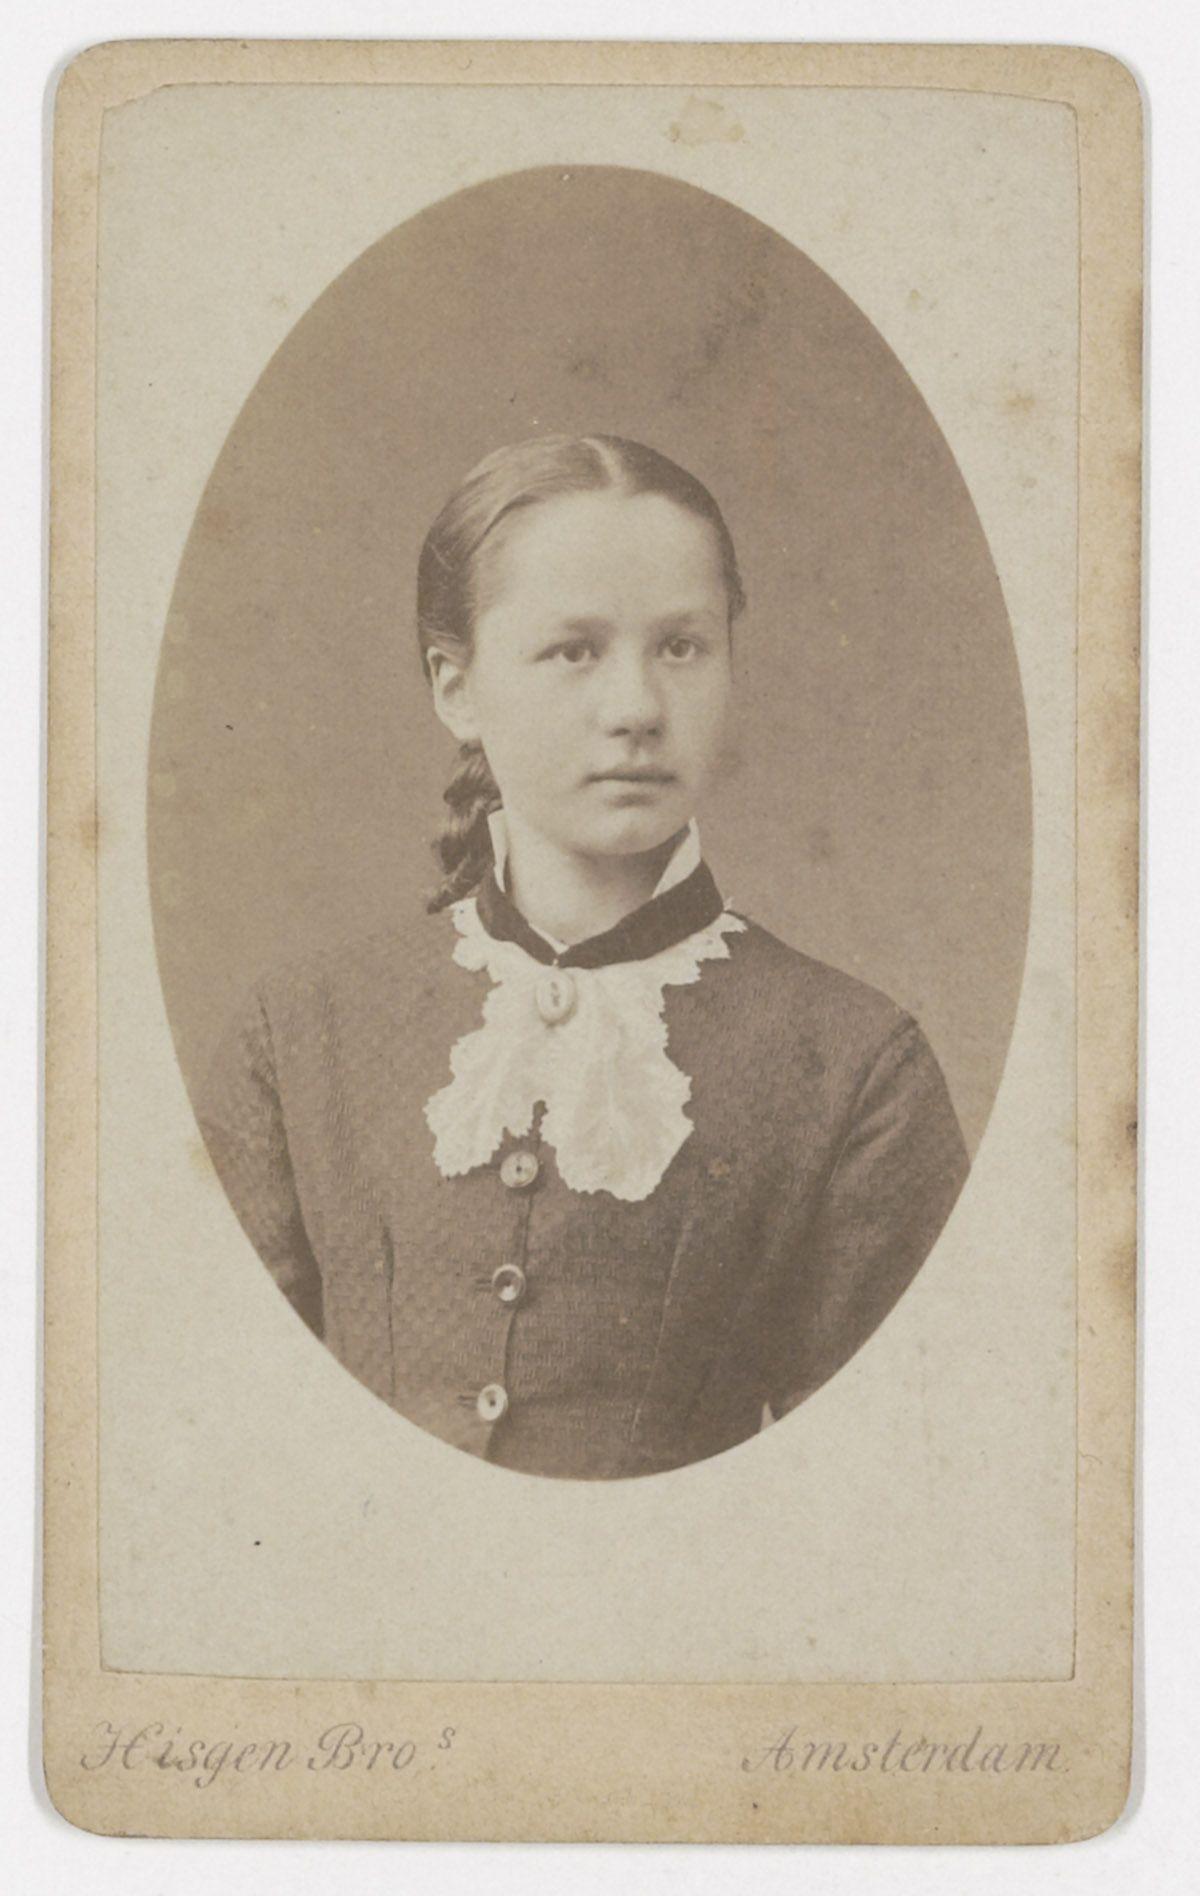 Jo van Gogh-Bonger as a young girl | Thesis | Pinterest | Van gogh, Vans and Artist